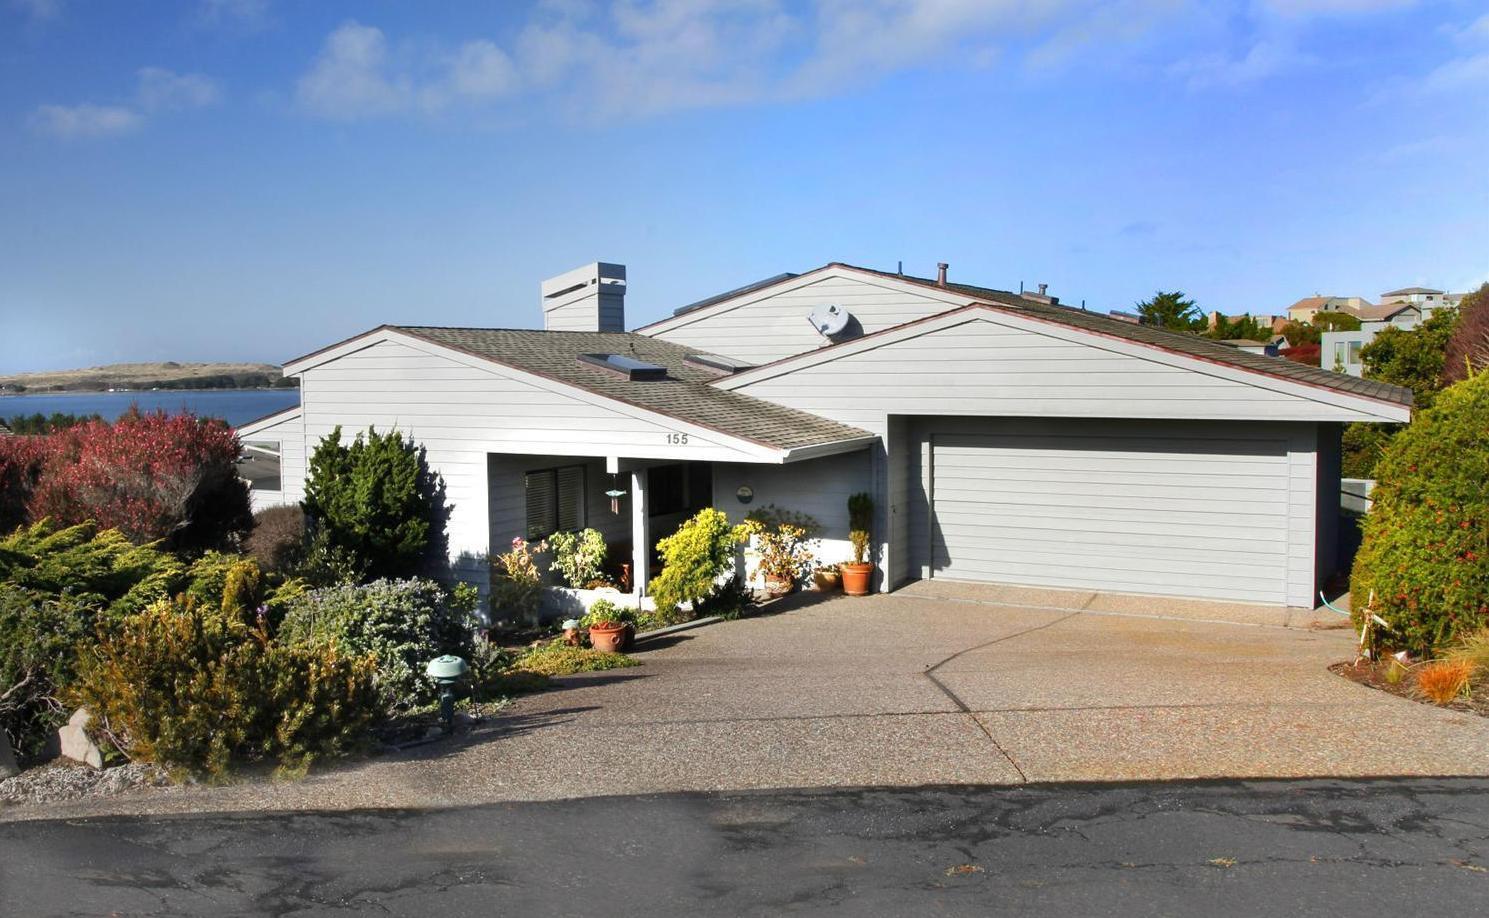 Bodega Bay CA Homes For Sale & Real Estate